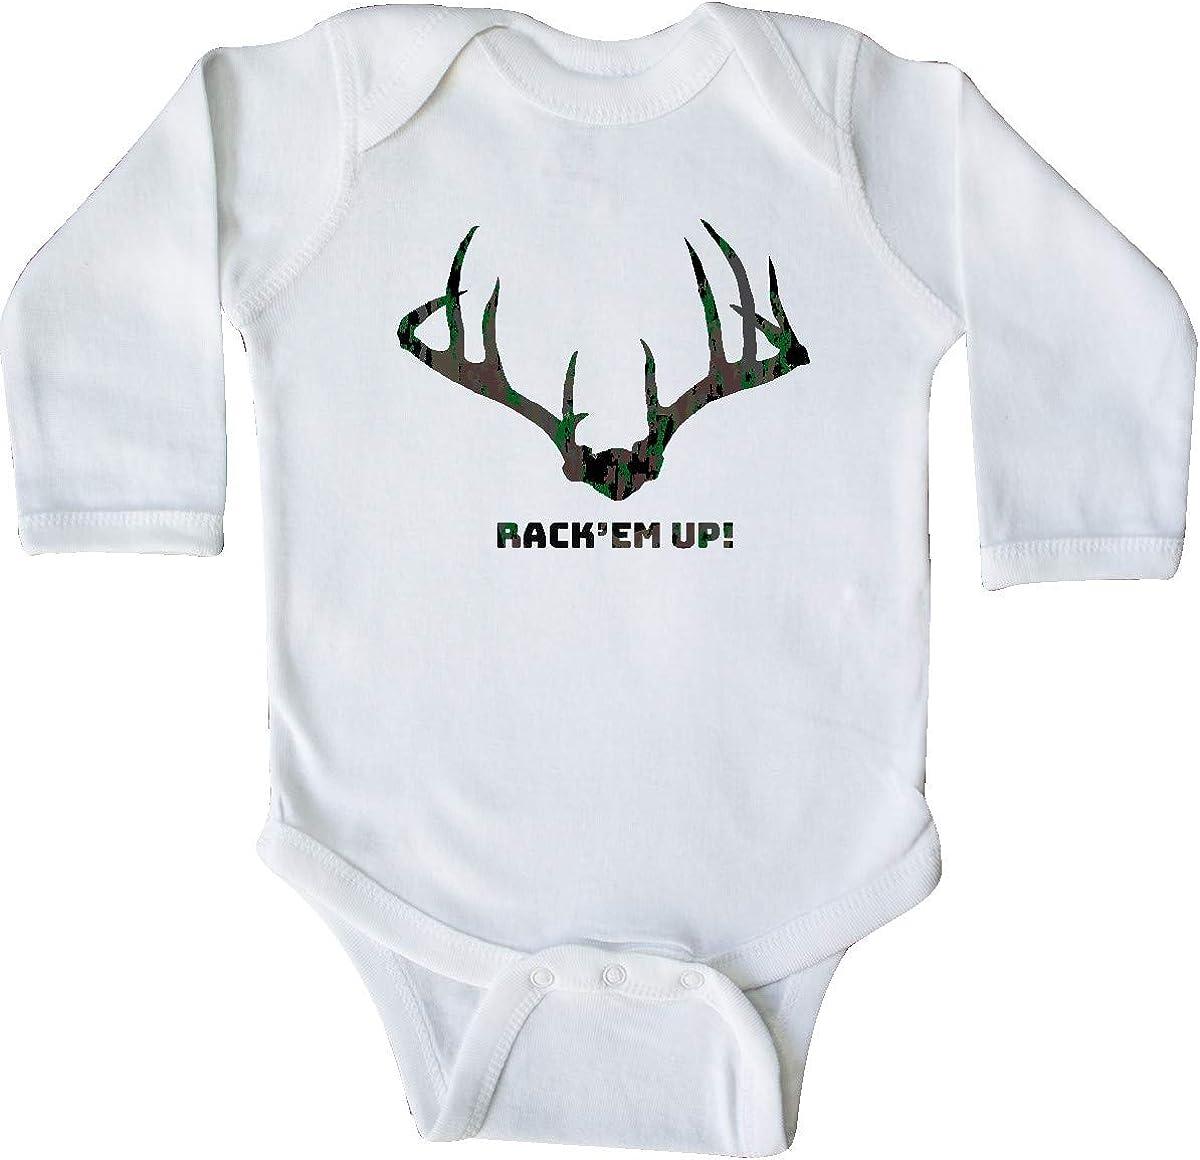 inktastic Rack Em Up in Camo Baby T-Shirt